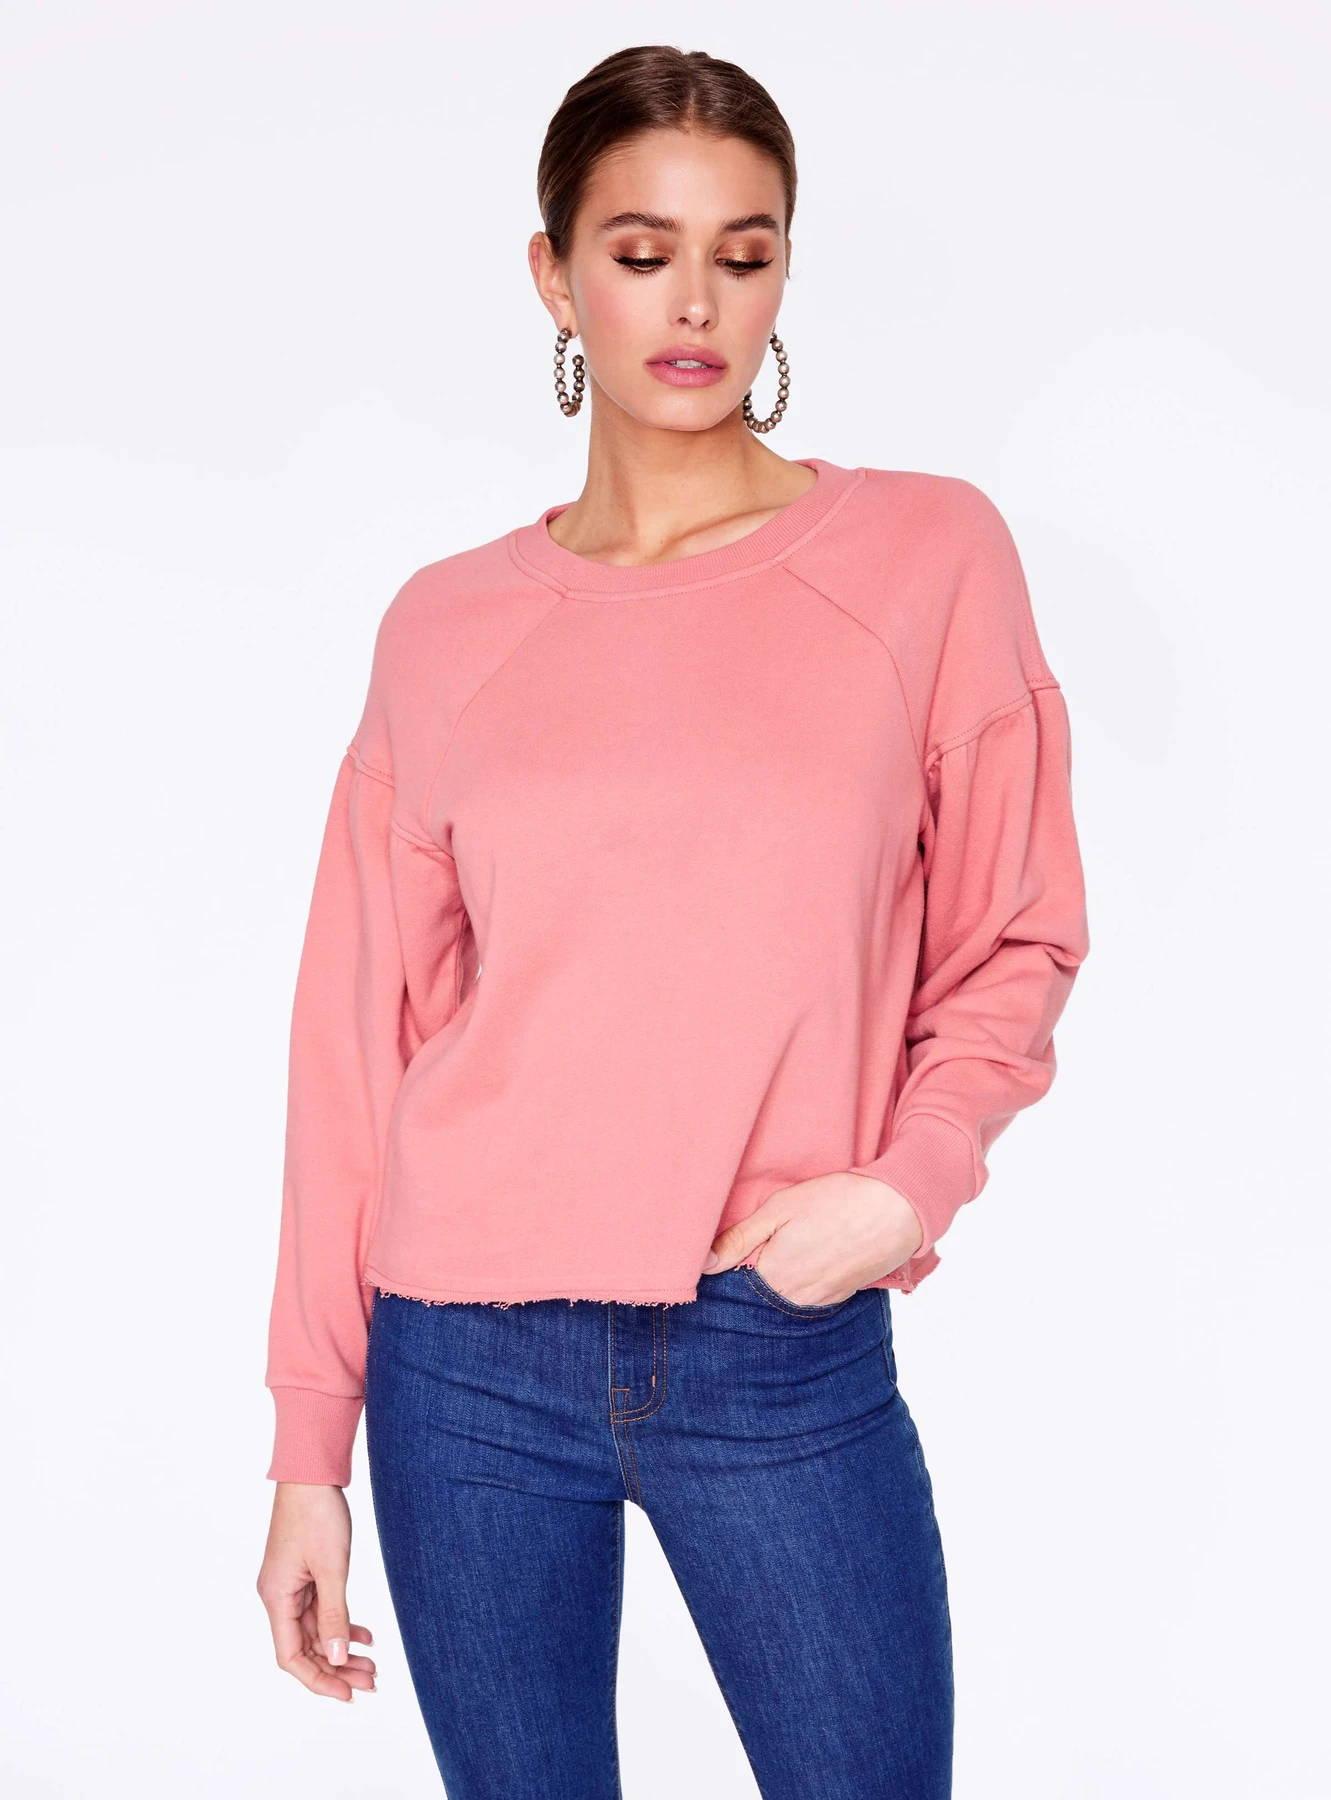 HeyYou Basic Long Sleeve Sweatshirt in Rose